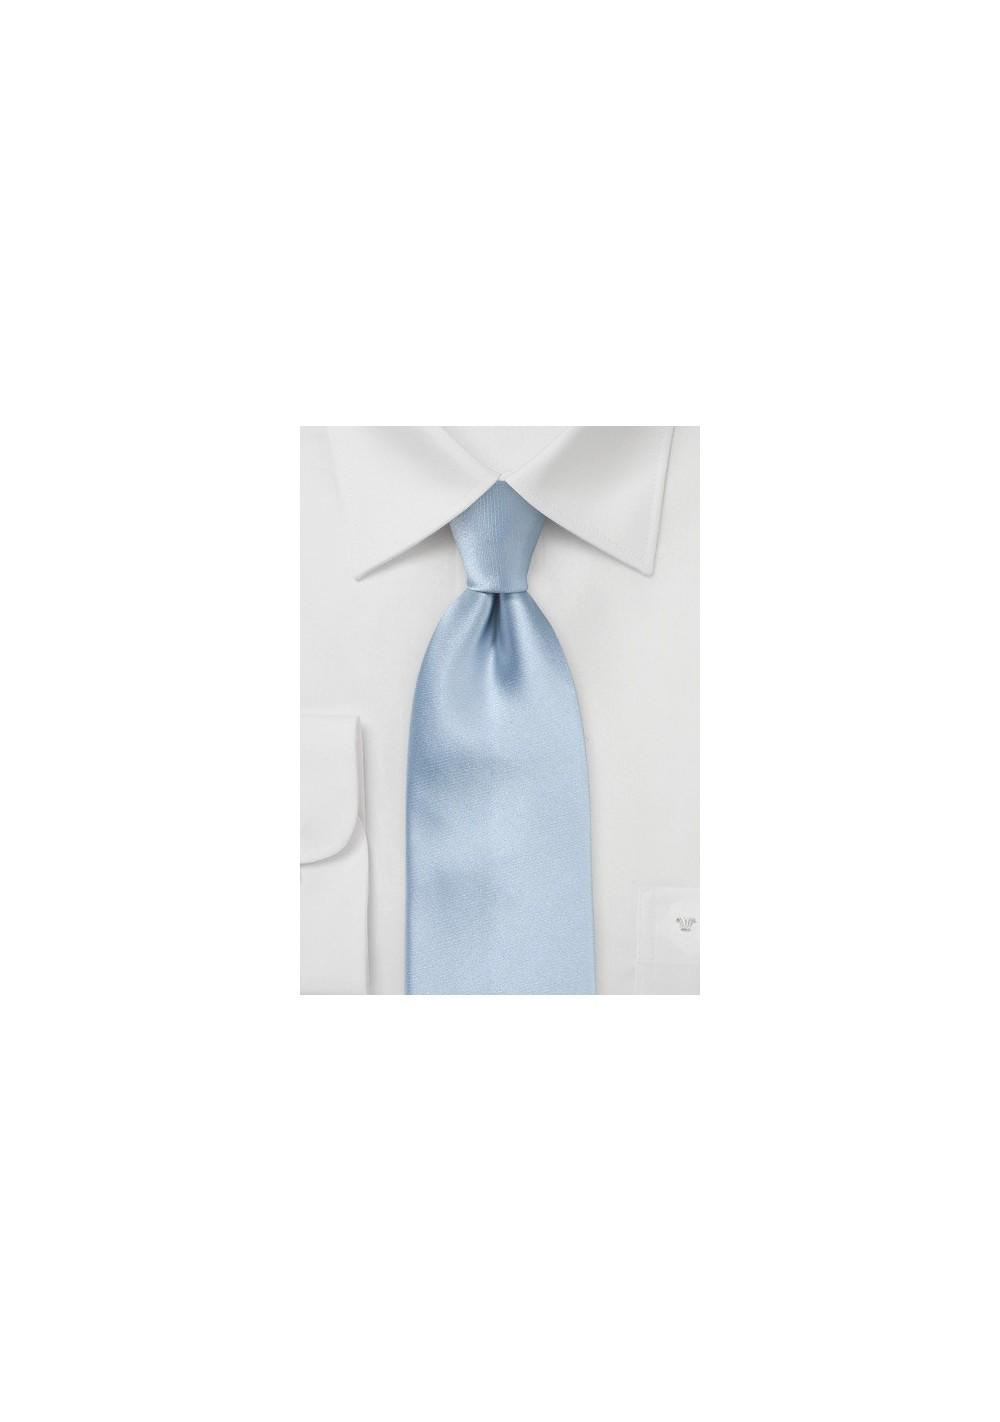 Light Blue Silk Tie in XL Length